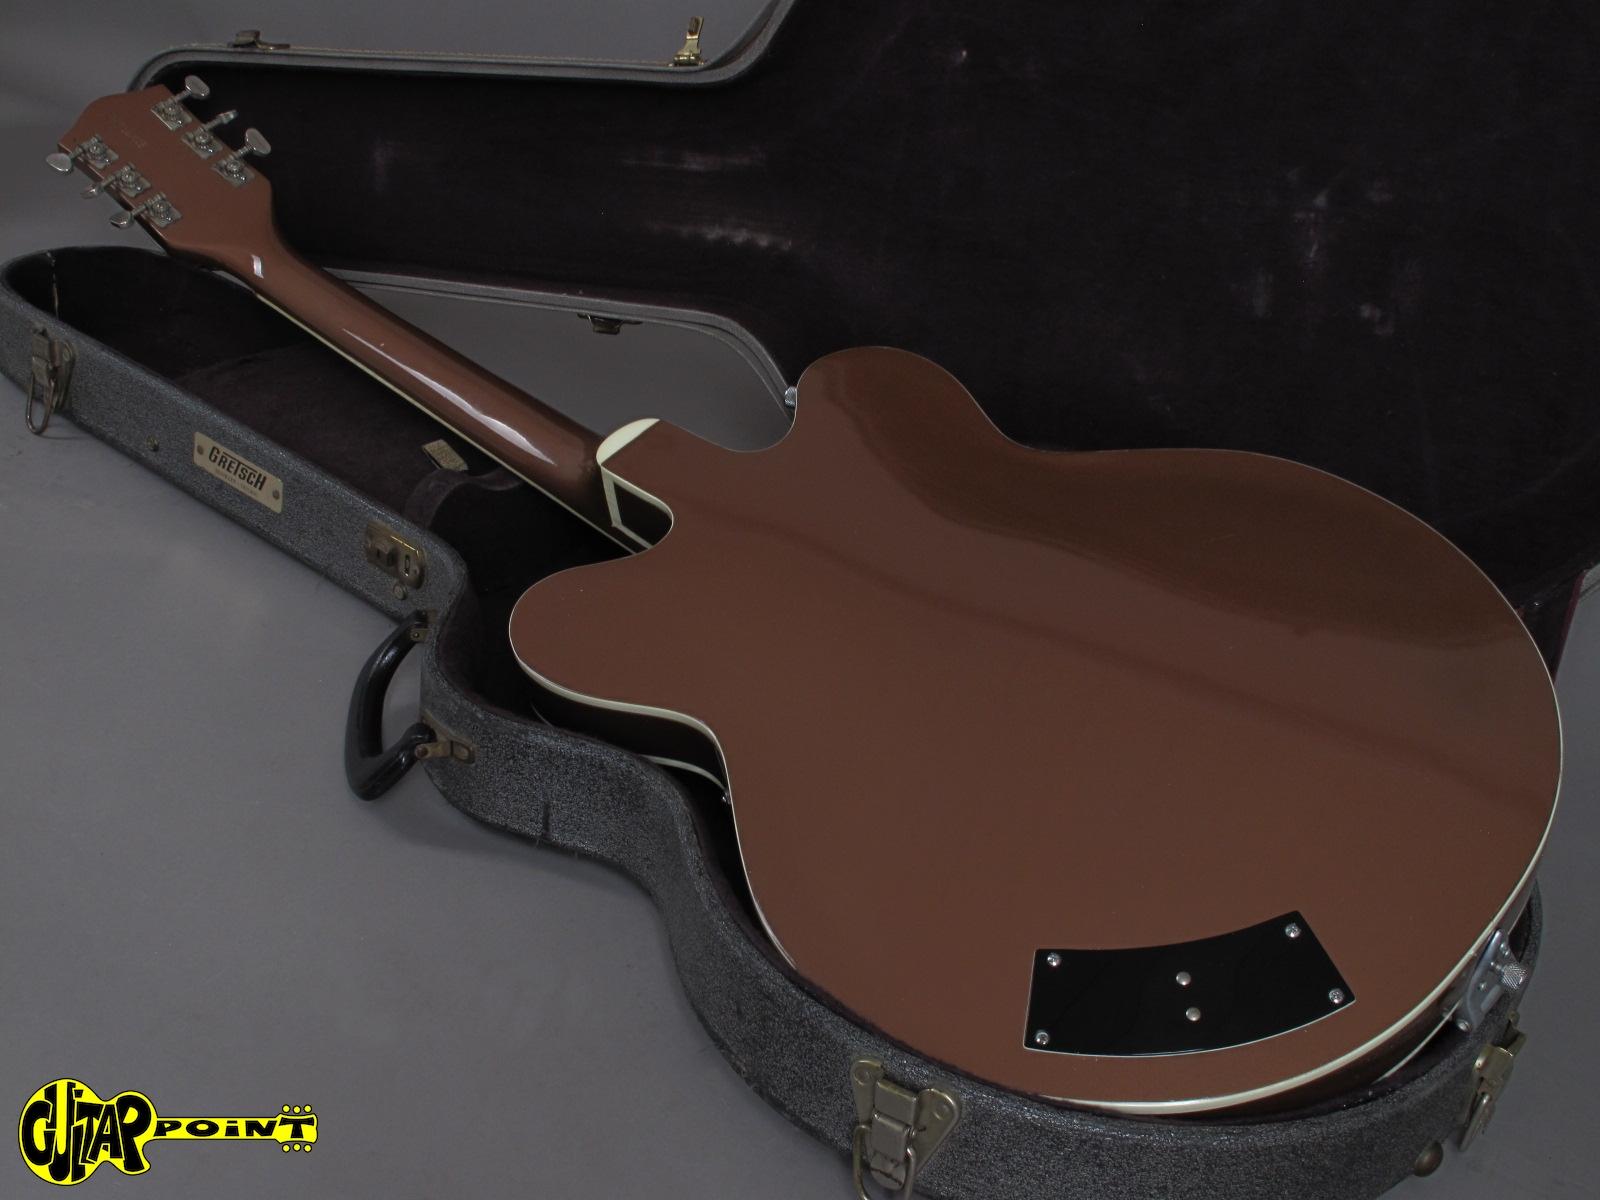 https://guitarpoint.de/app/uploads/products/1967-gretsch-6105-rally-bamboo-yellow-copper-mist-clean/Gretsch67RallyYelw107626_12.jpg